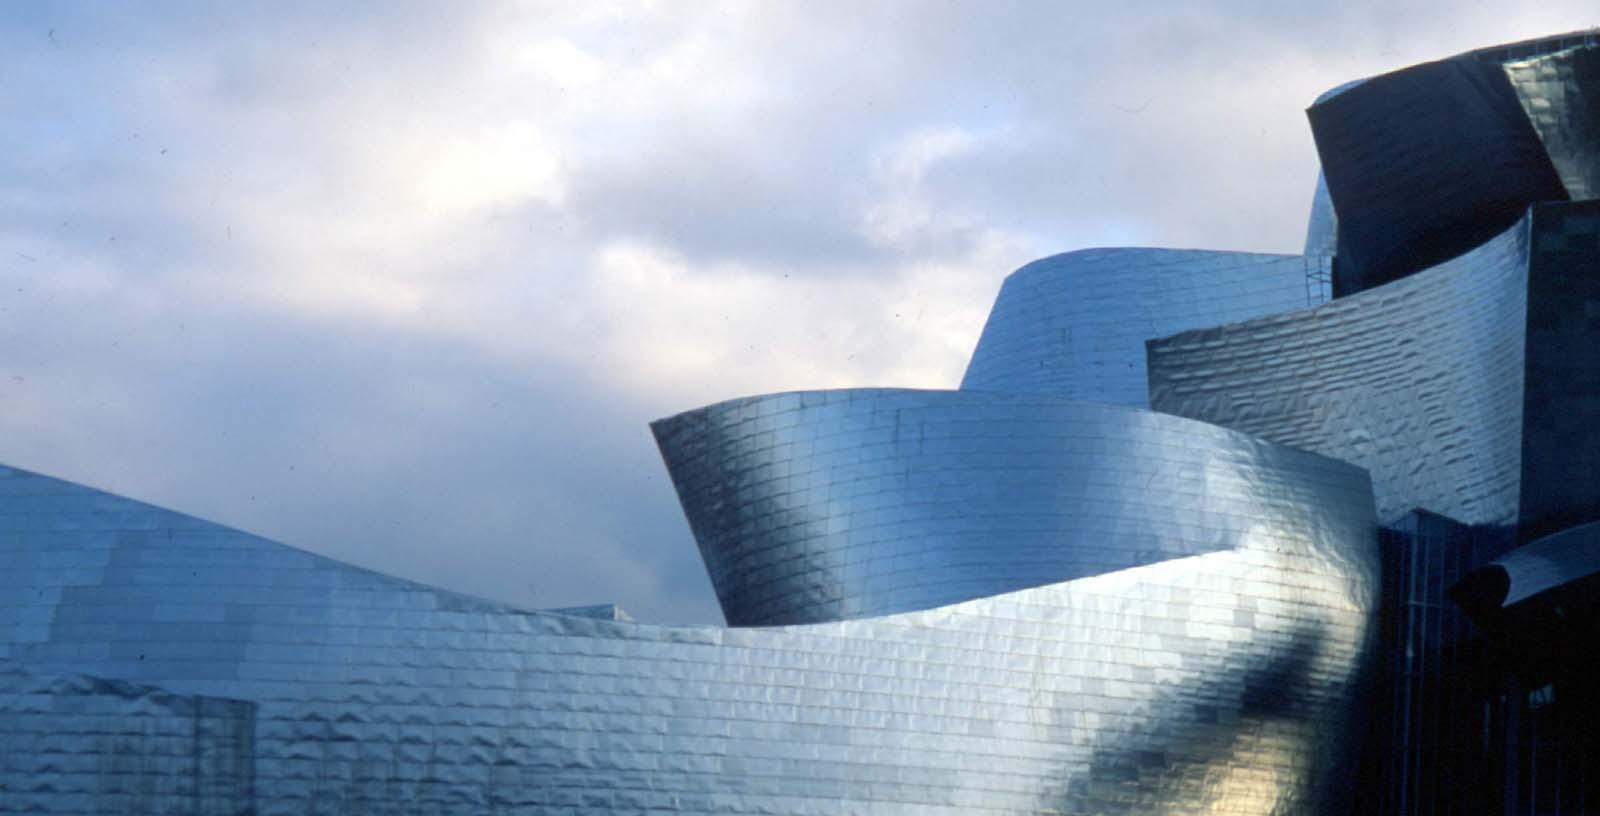 Guggenheim_Museum_02_Building_Idom